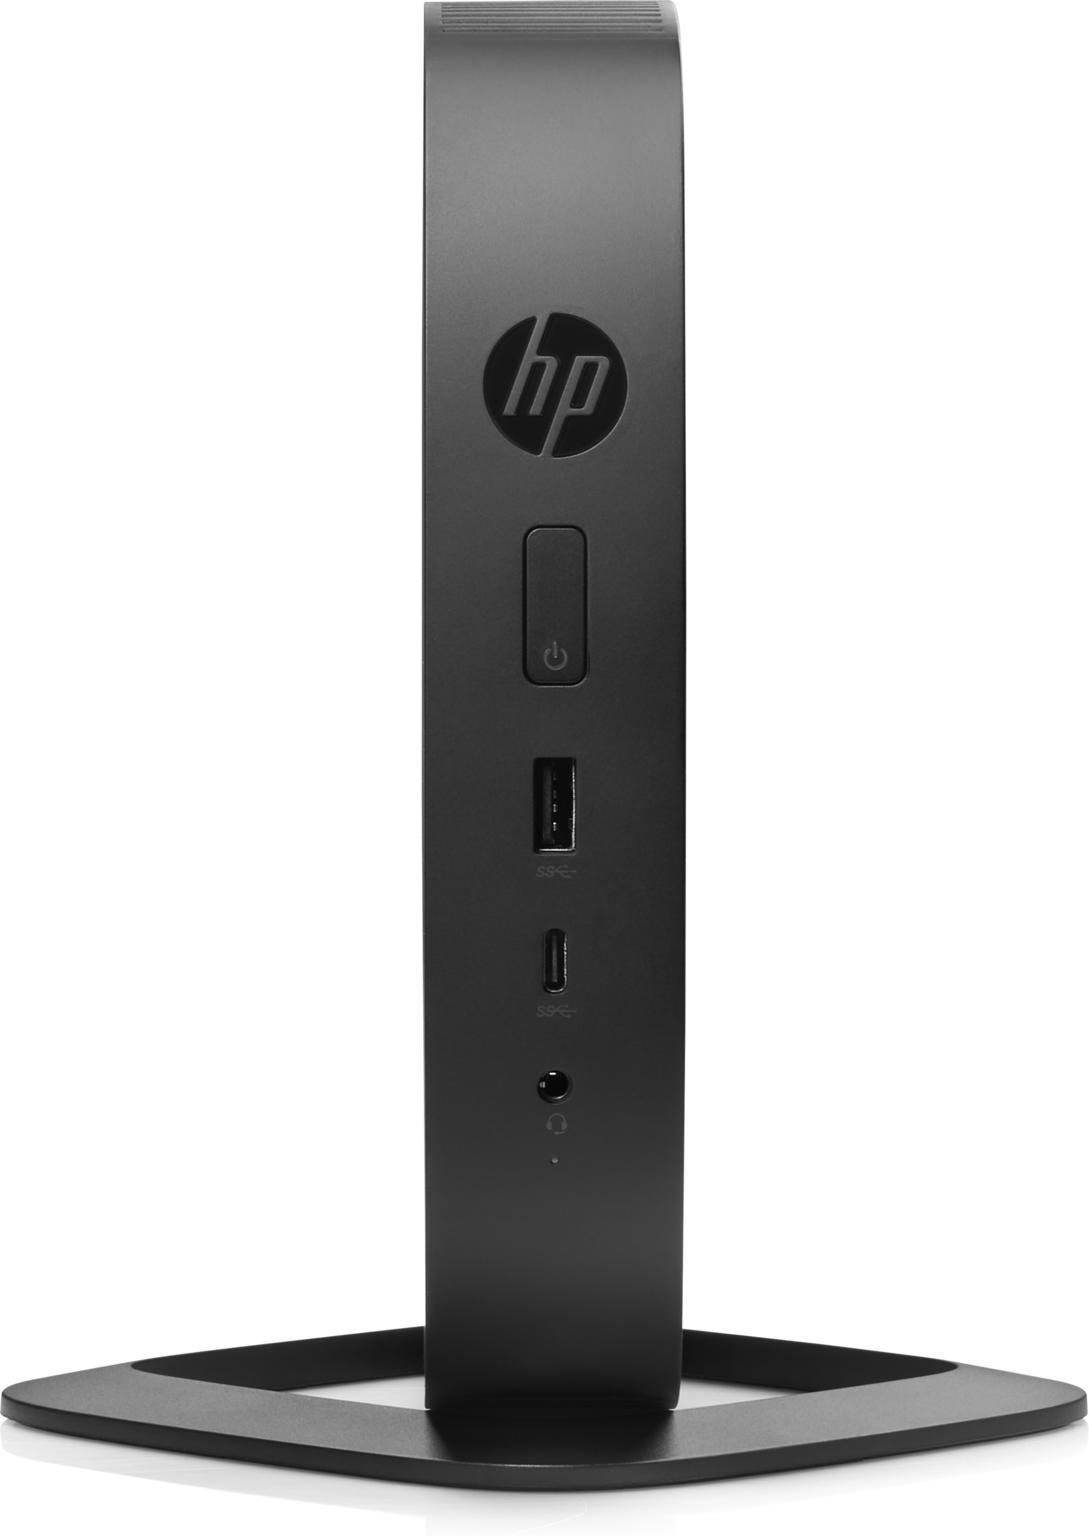 HP Thin Client T530 2RC26EA